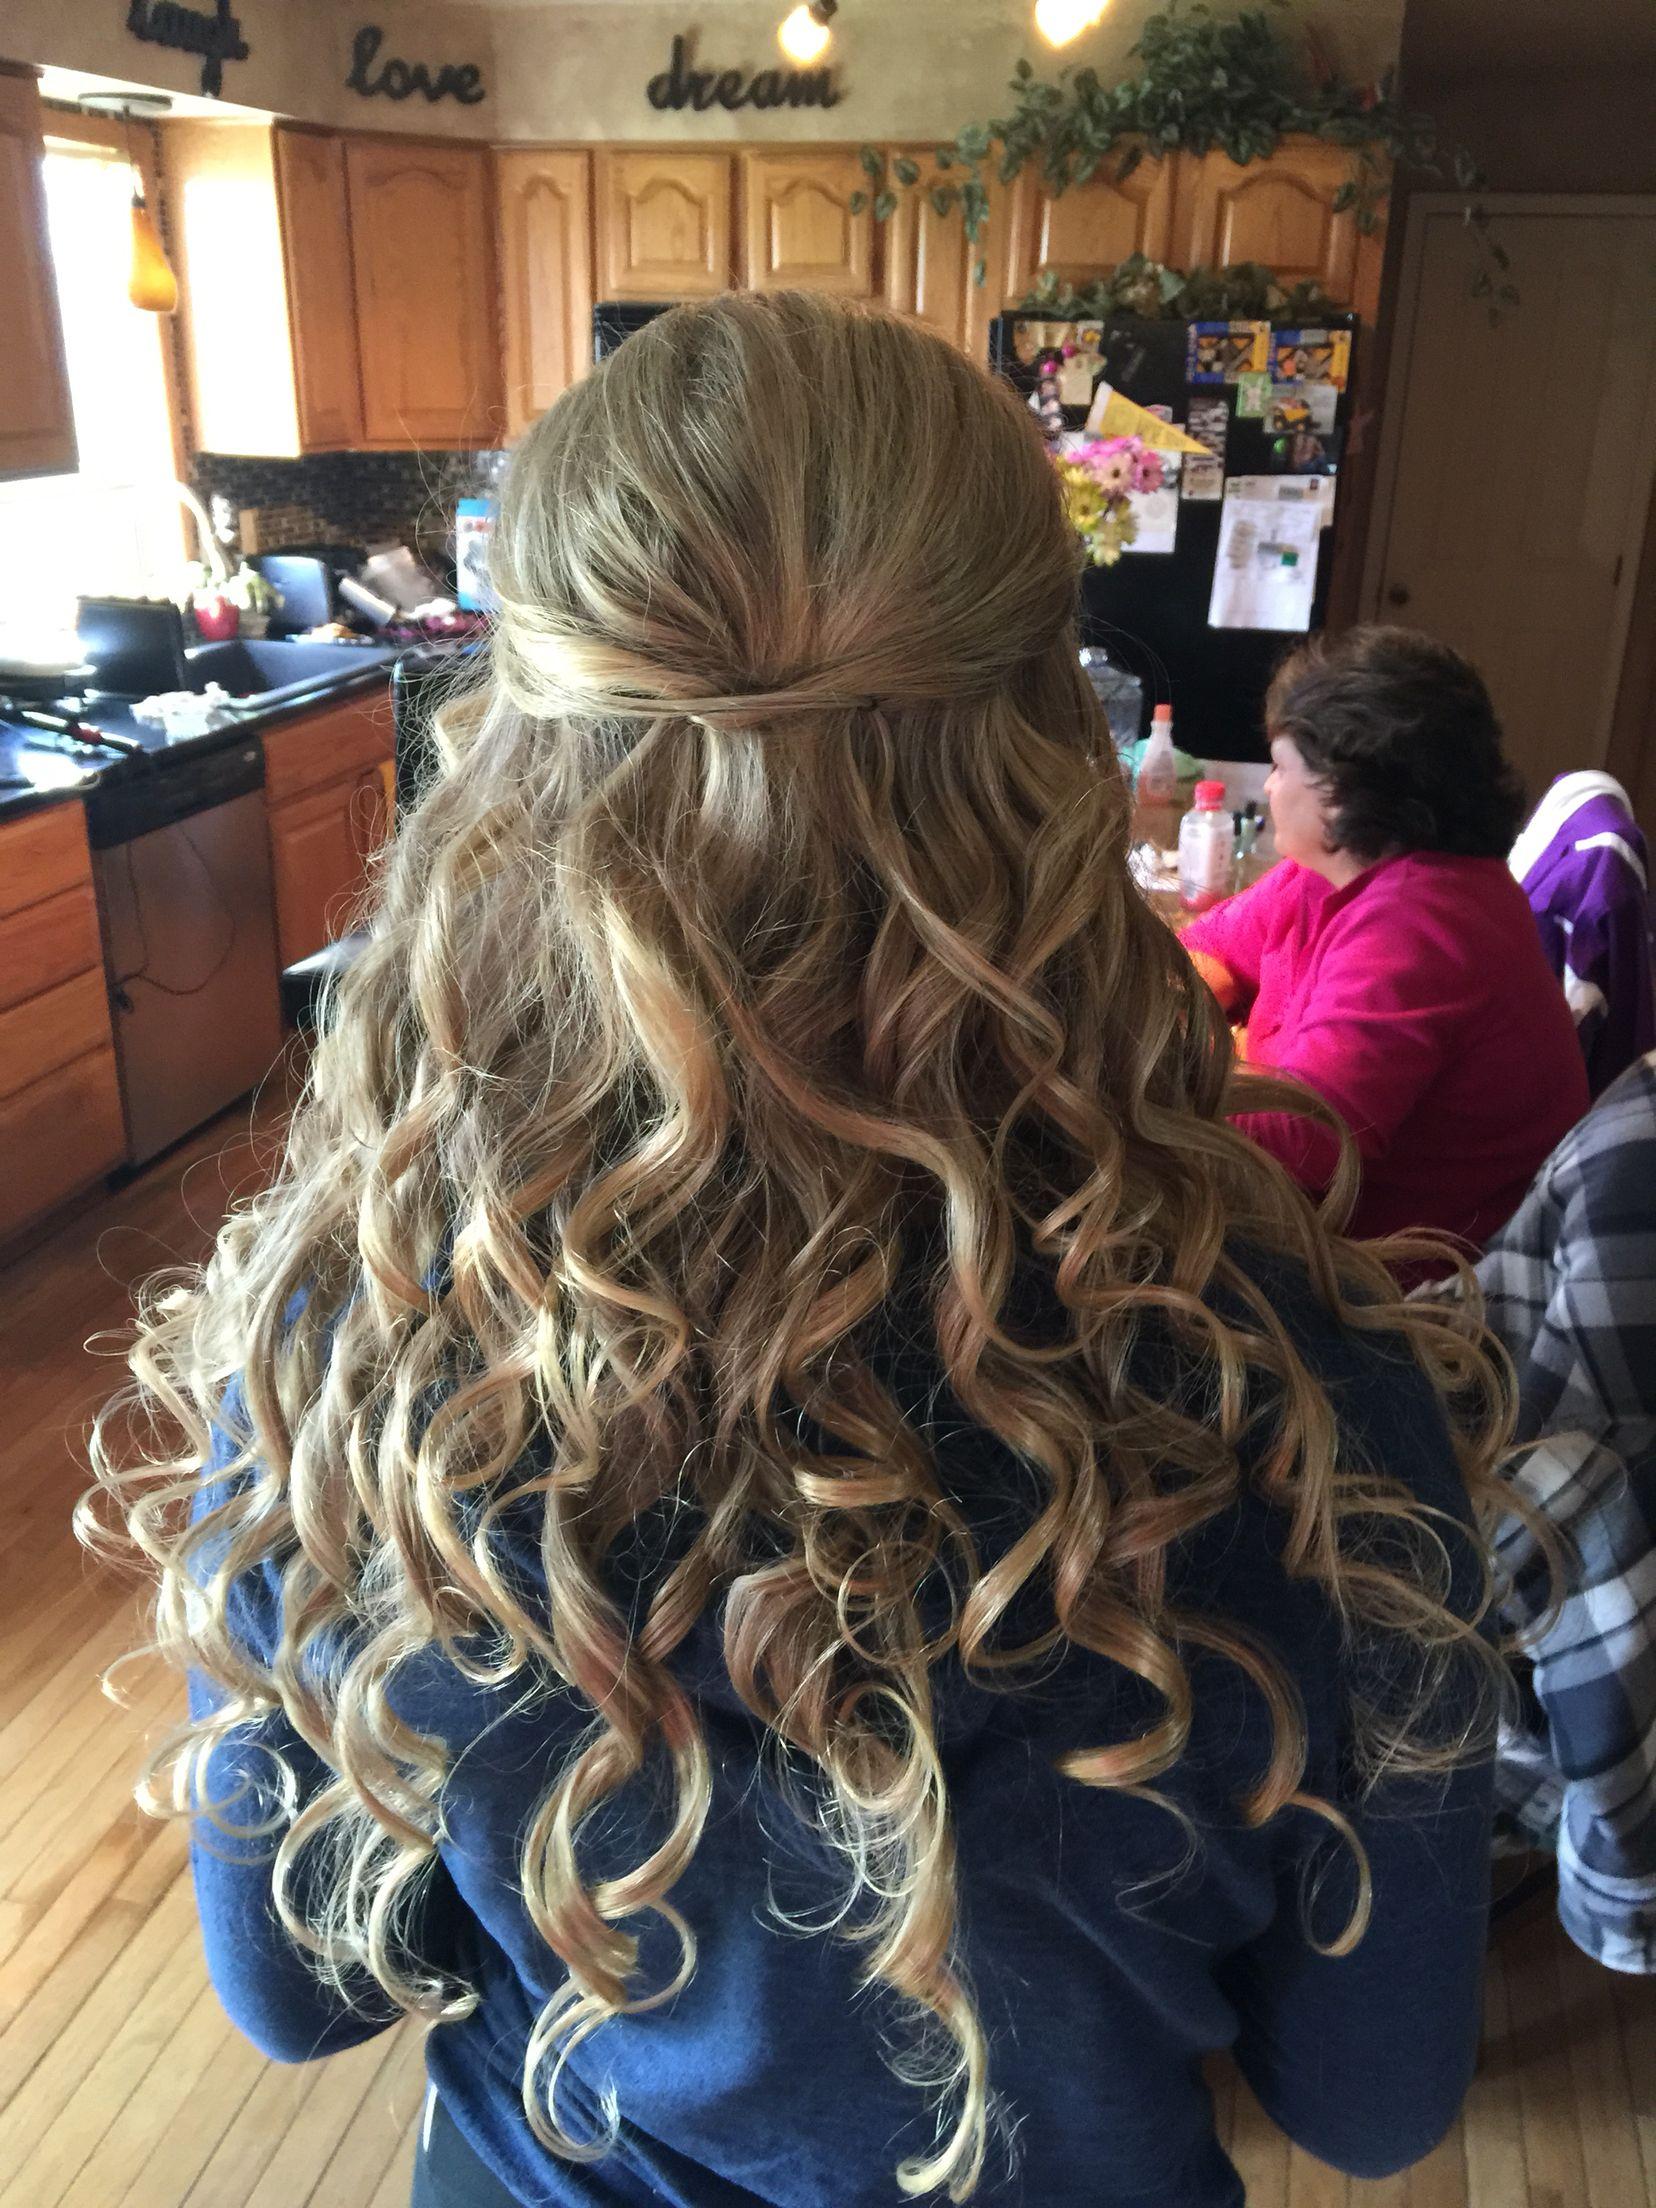 Prom Hair Ideas - Half Up, Half Down | Hair styles, Simple ...